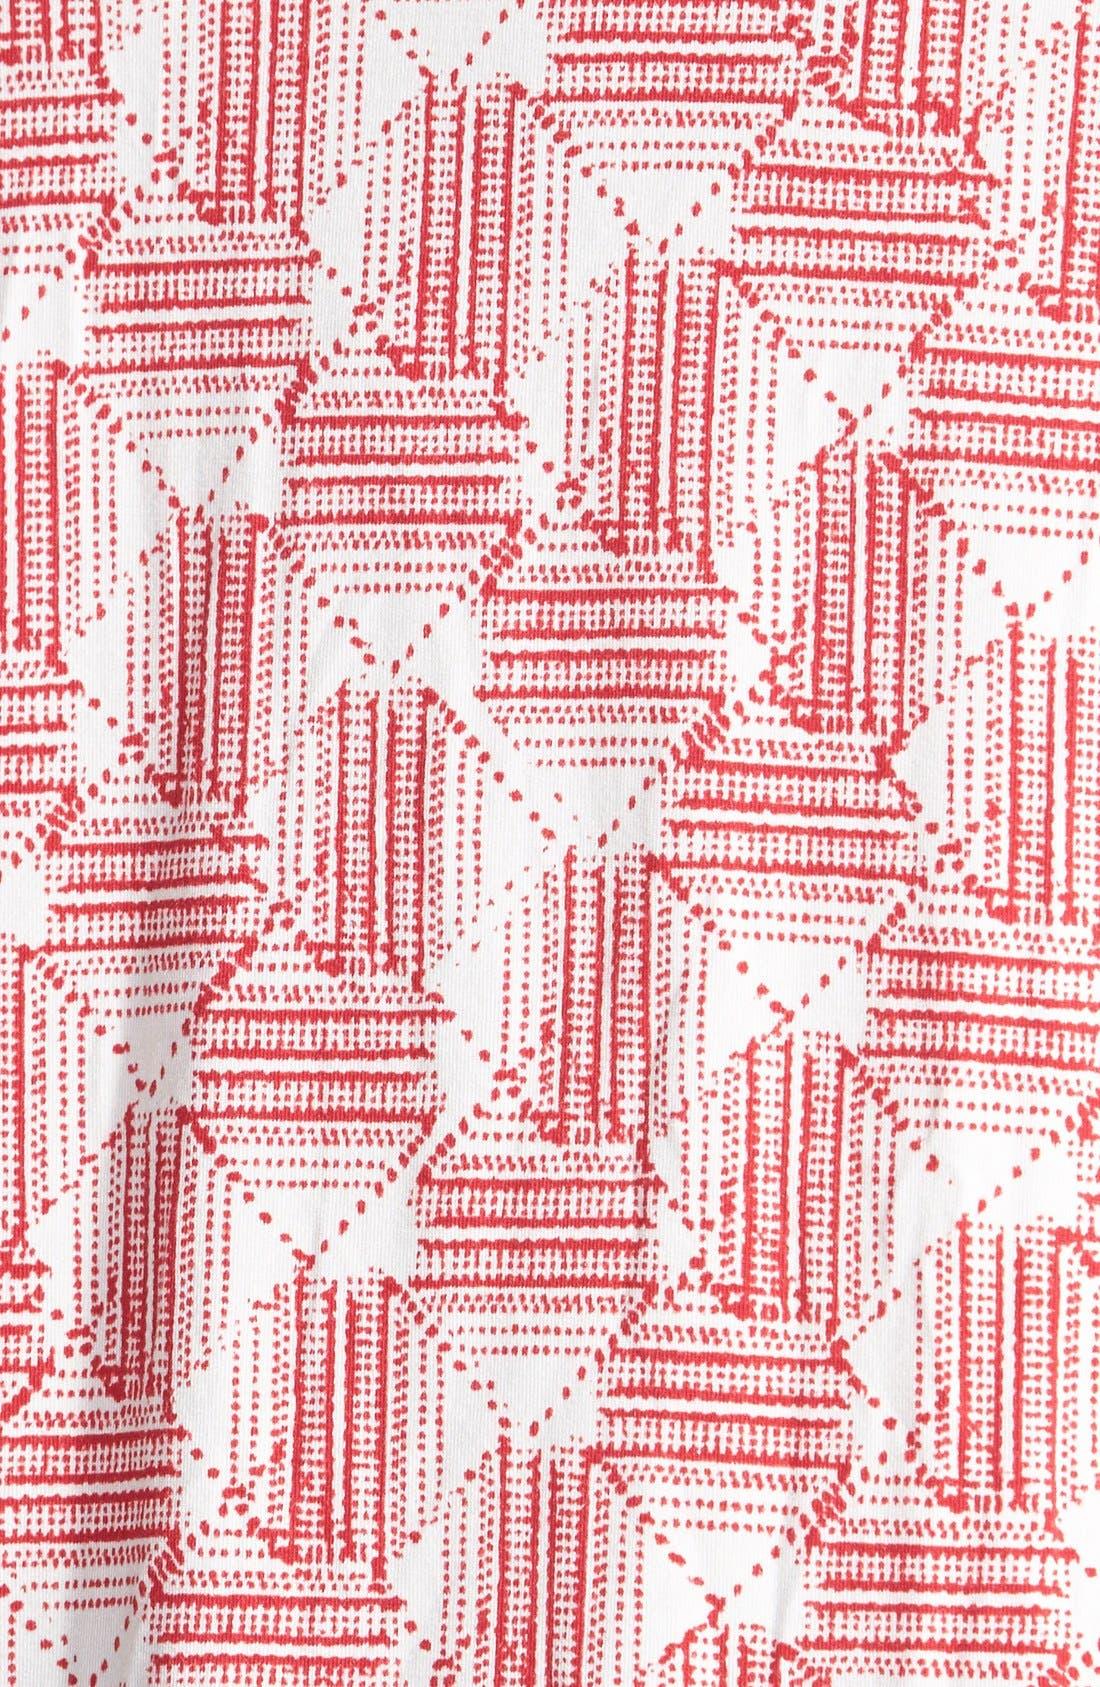 'Aryn' Sleeveless V-Neck Jersey Top,                             Alternate thumbnail 3, color,                             Batik Diamond